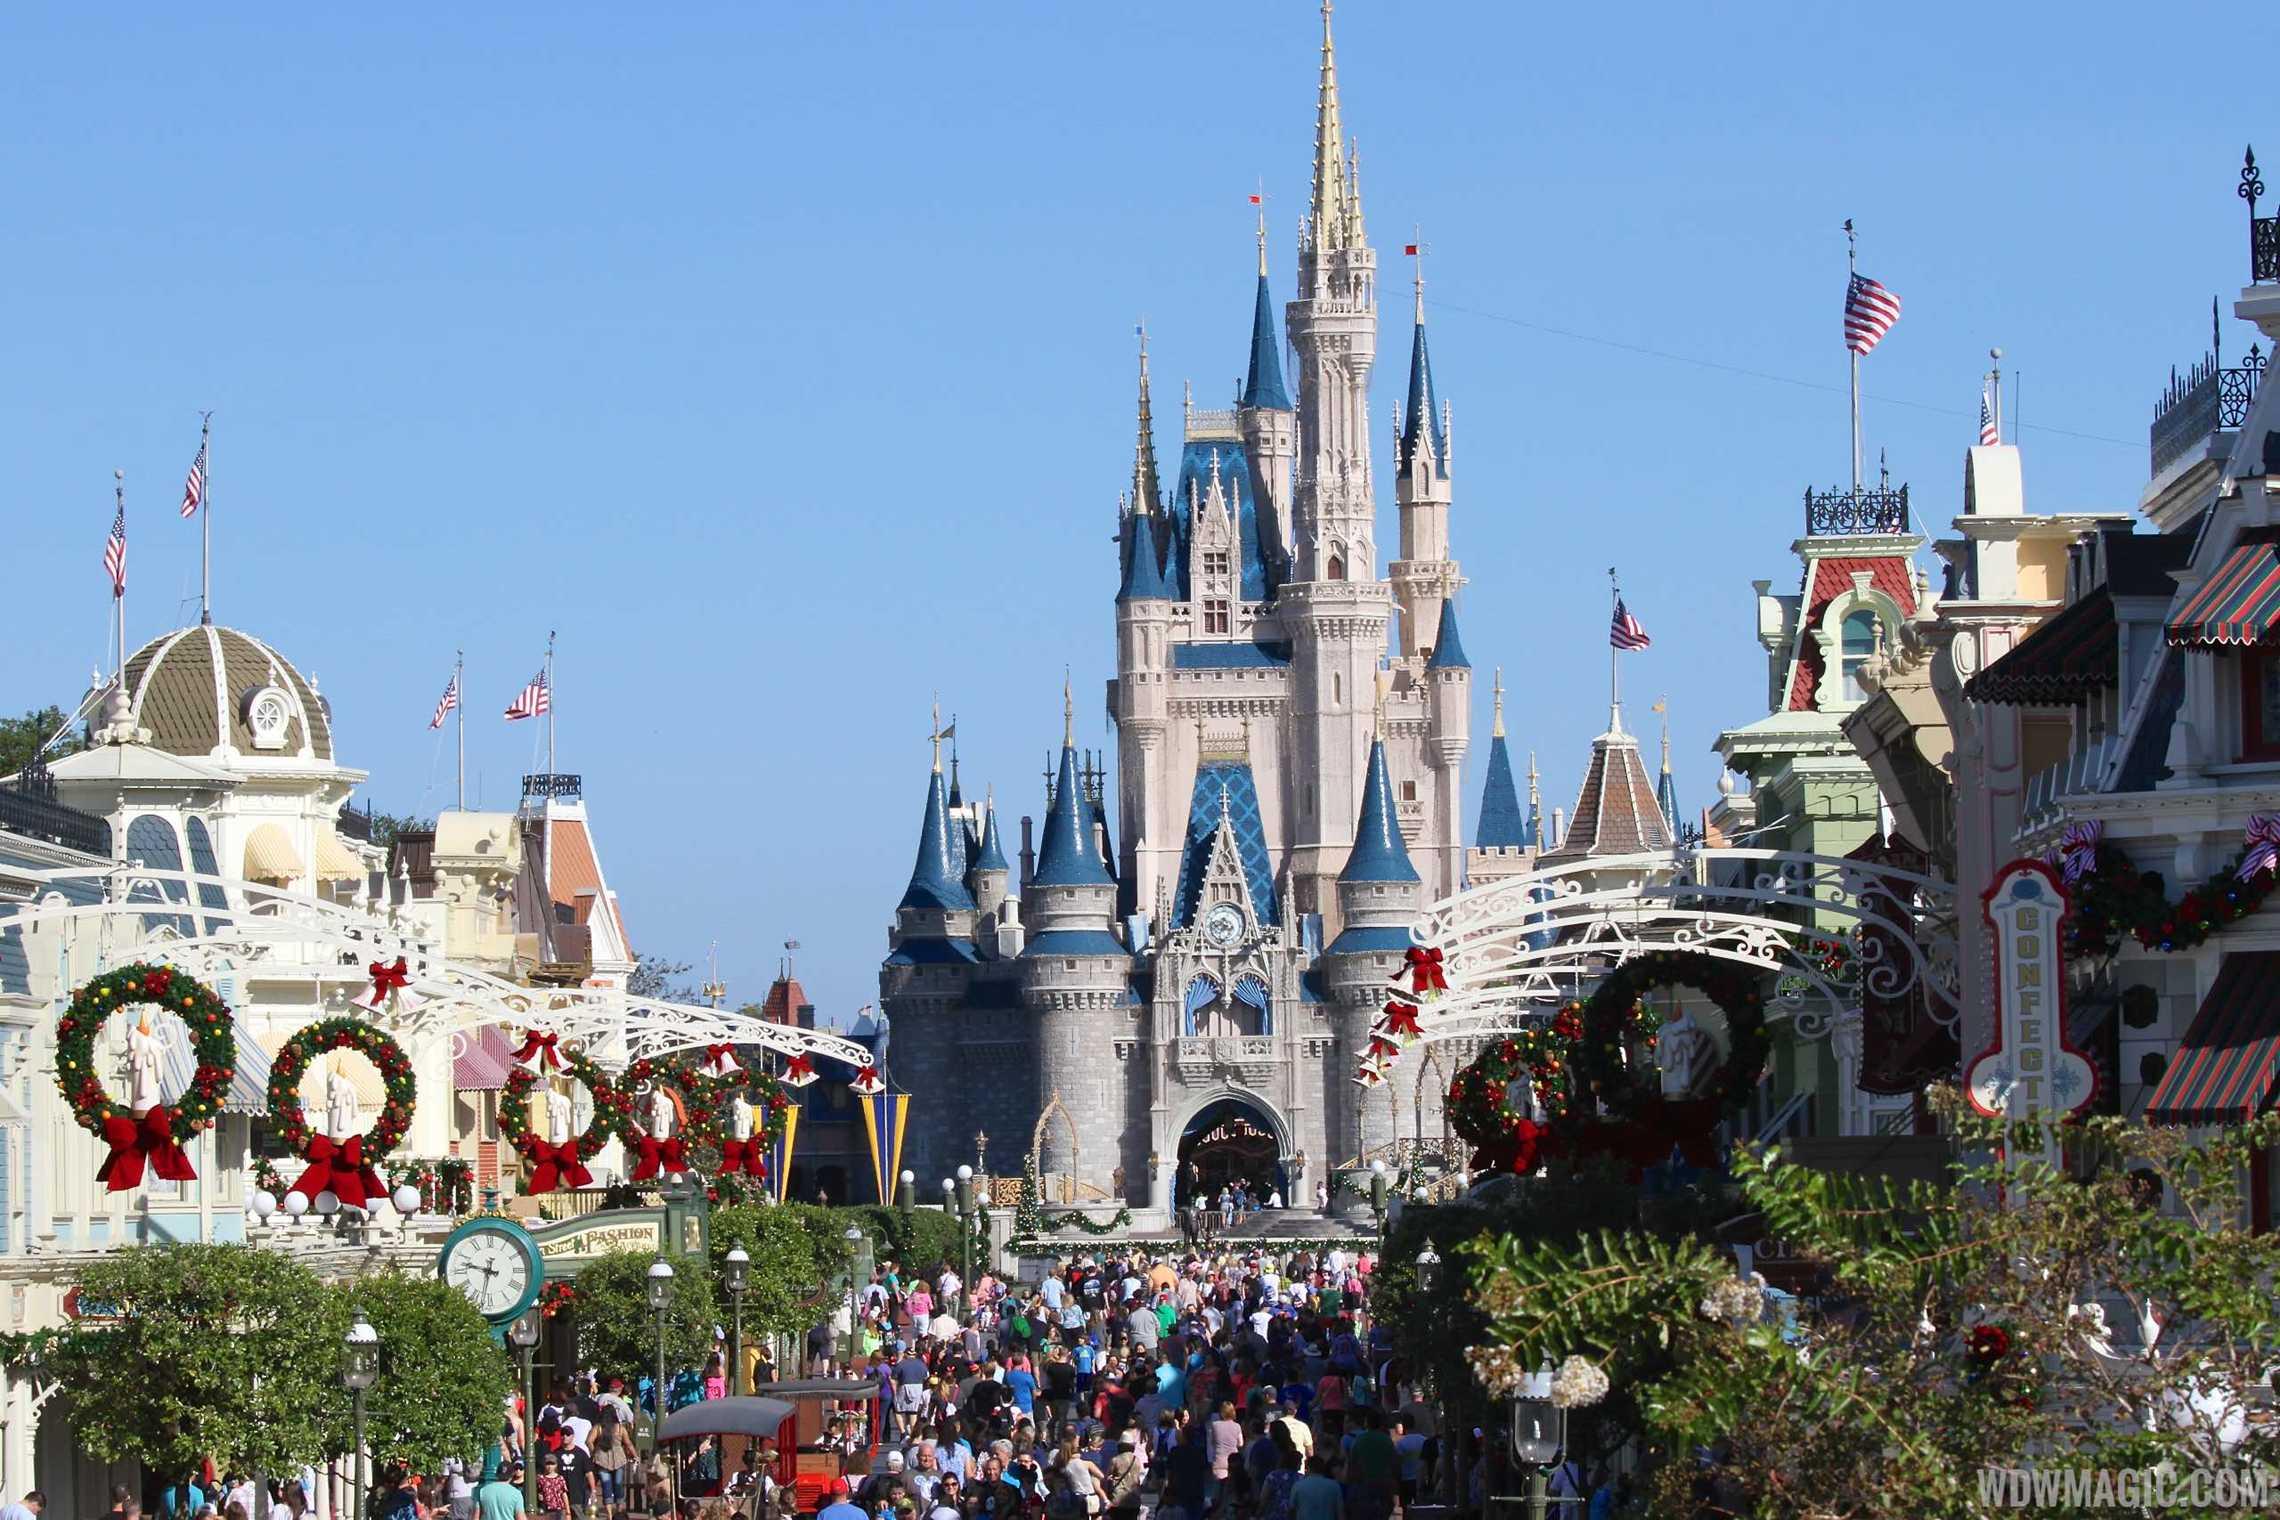 Magic Kingdom decorations